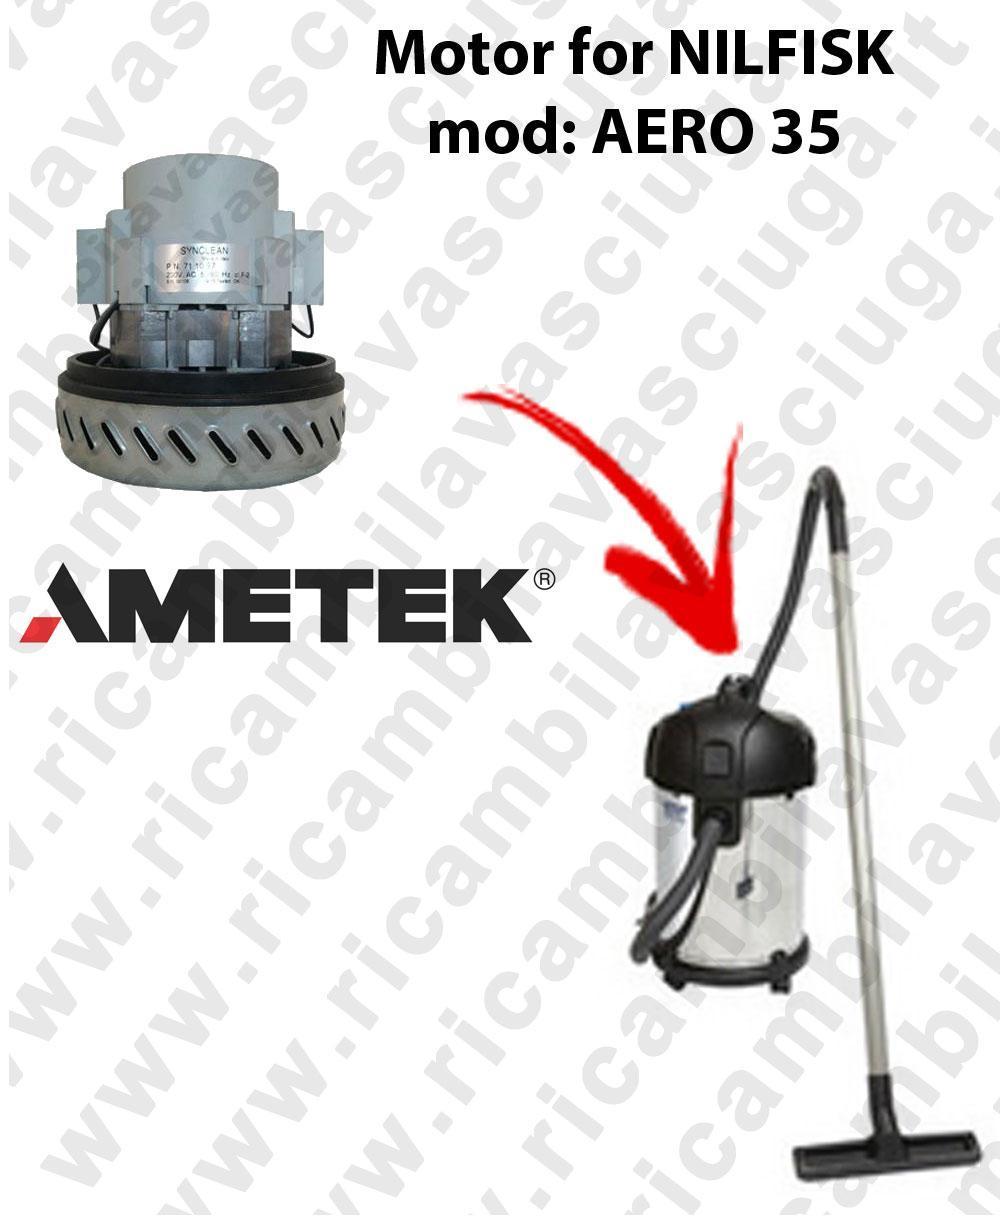 AERO 35 MOTEUR ASPIRATION AMETEK  pour aspirateur NILFISK ALTO